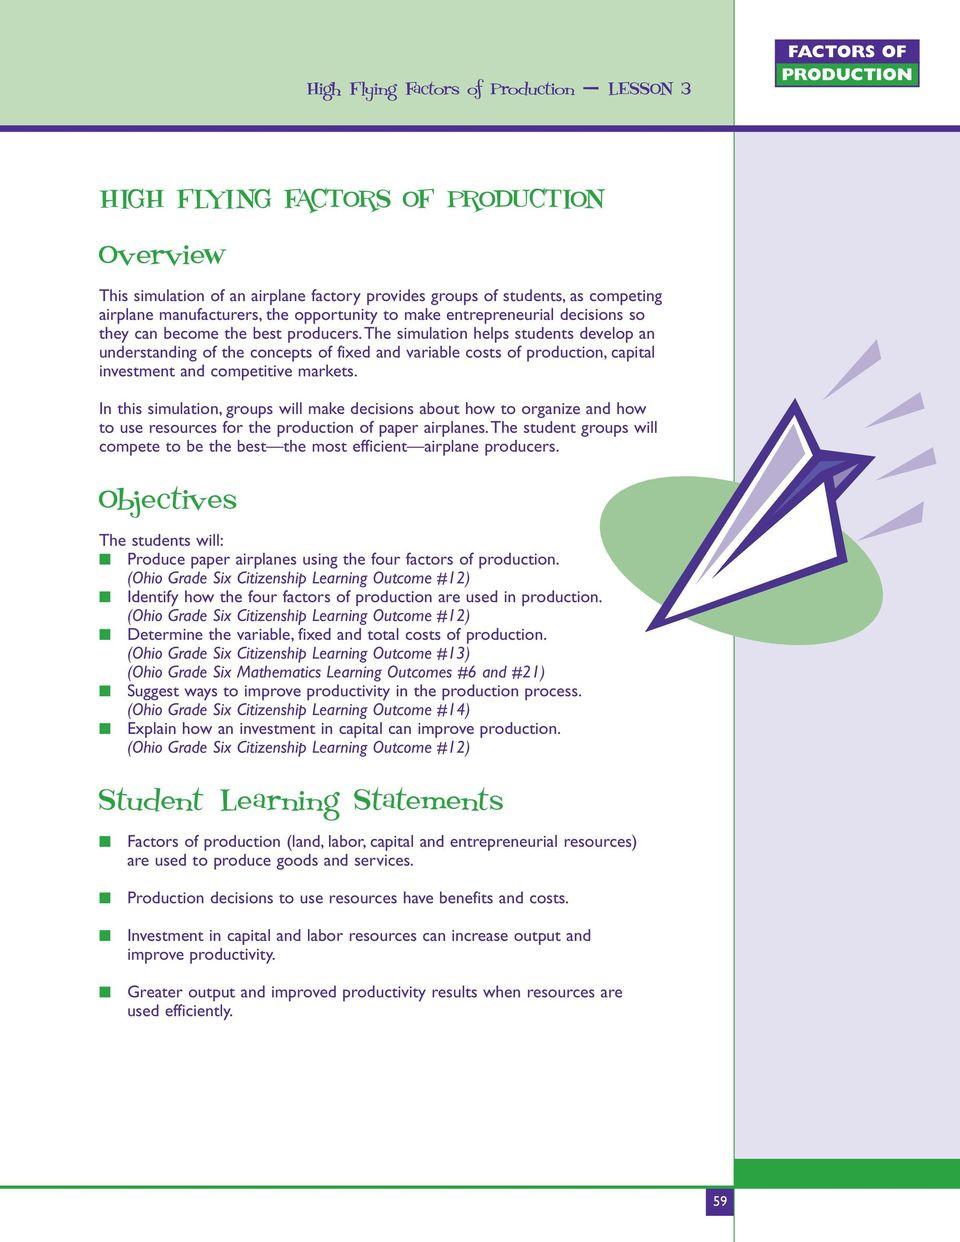 Factors Of Production Worksheet High Flying Factors Of Production Lesson 3 High Flying